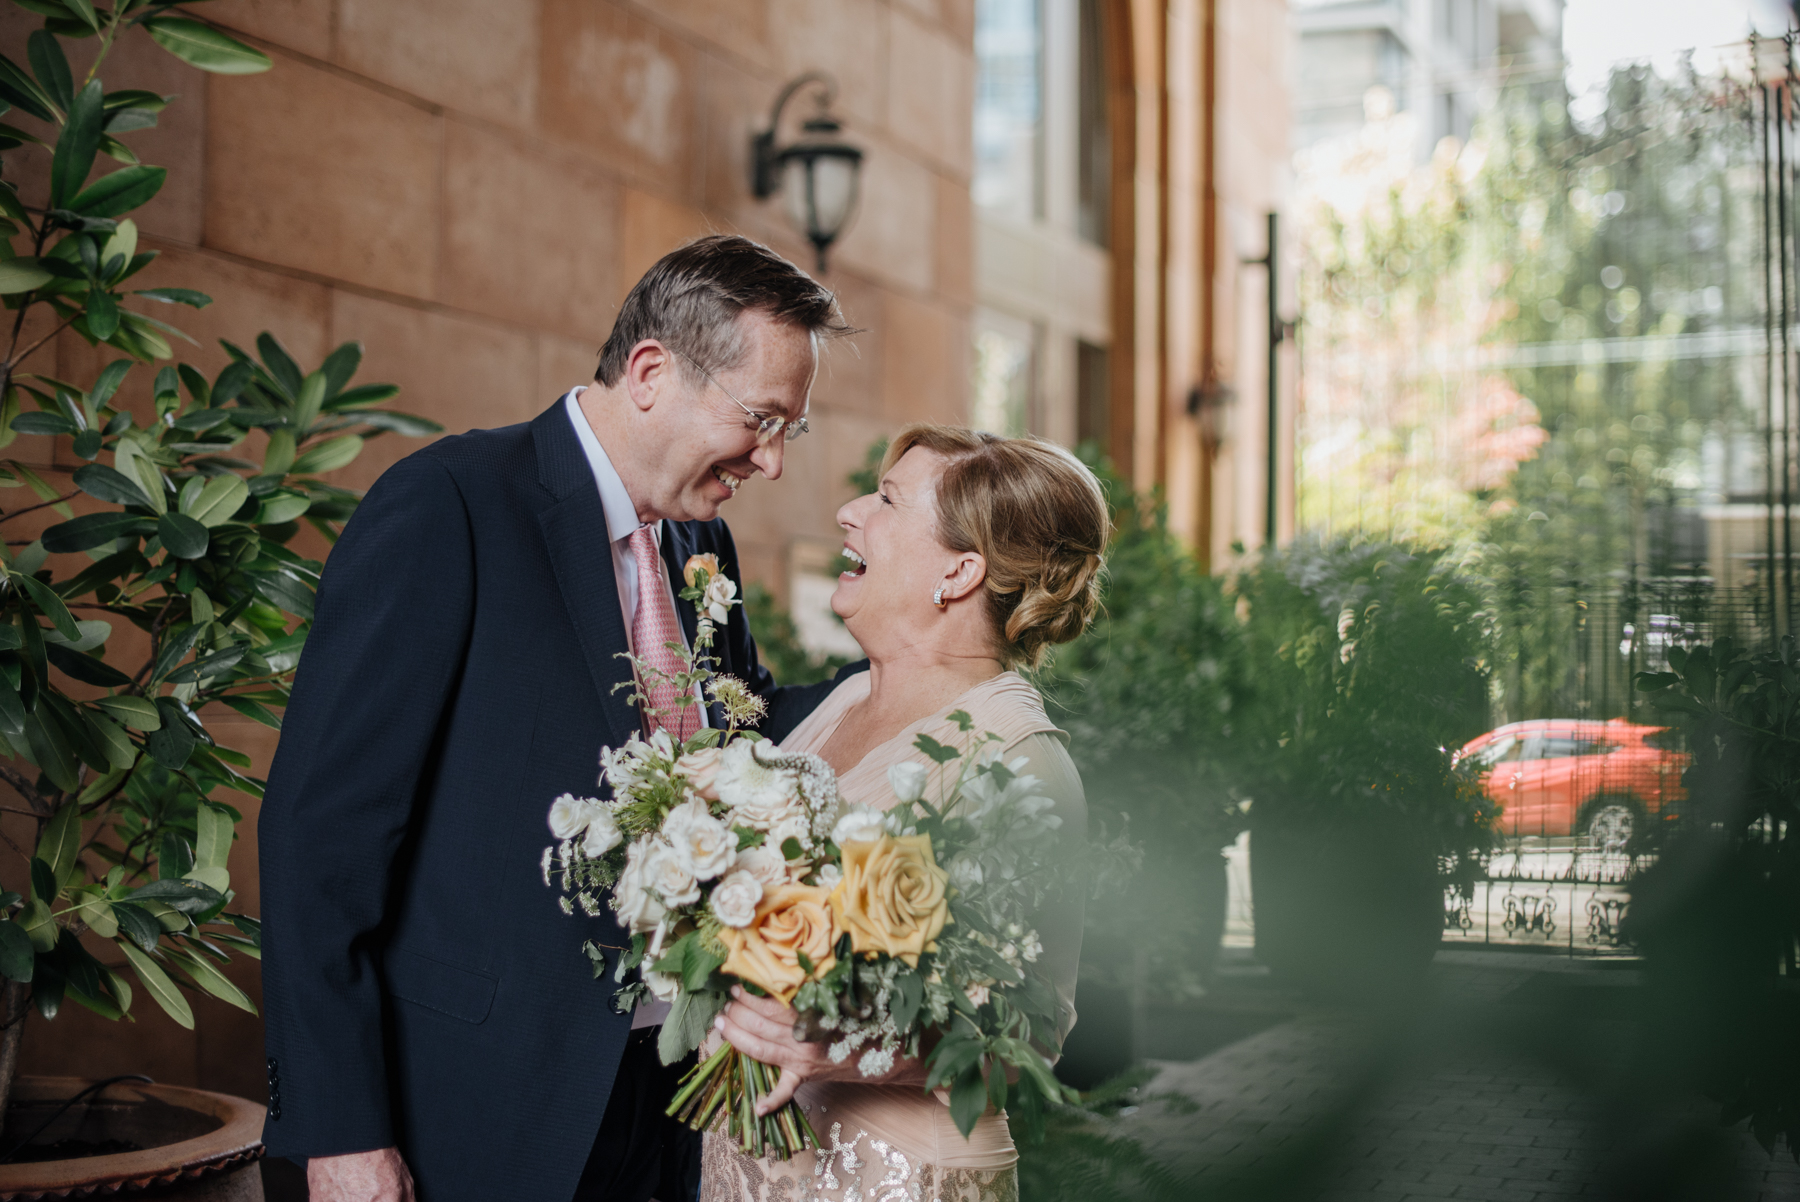 kaoverii_silva_photographer_cynthia_richard_wedding_vancouver_brix_&_mortar-7.jpg